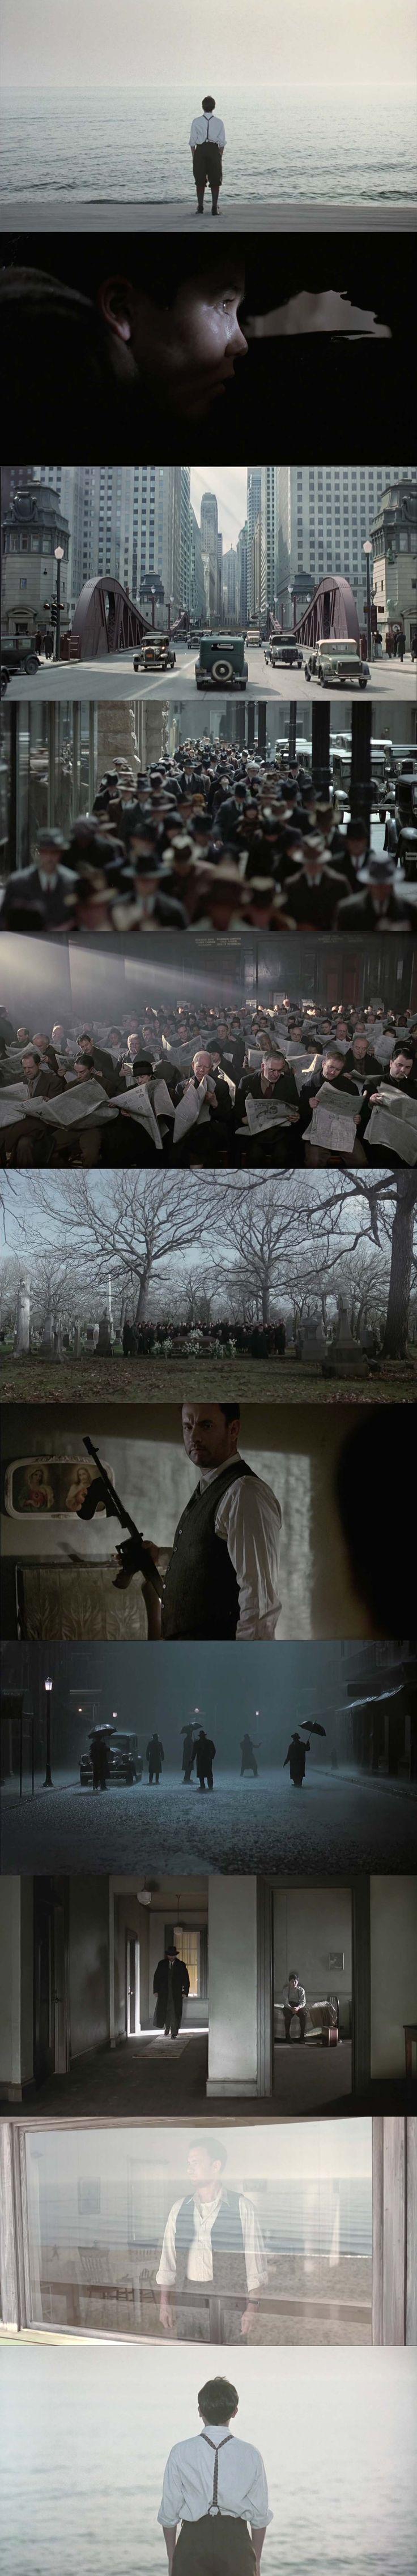 Road to Perdition (Sam Mendes, 2002) DoP: Conrad L. Hall